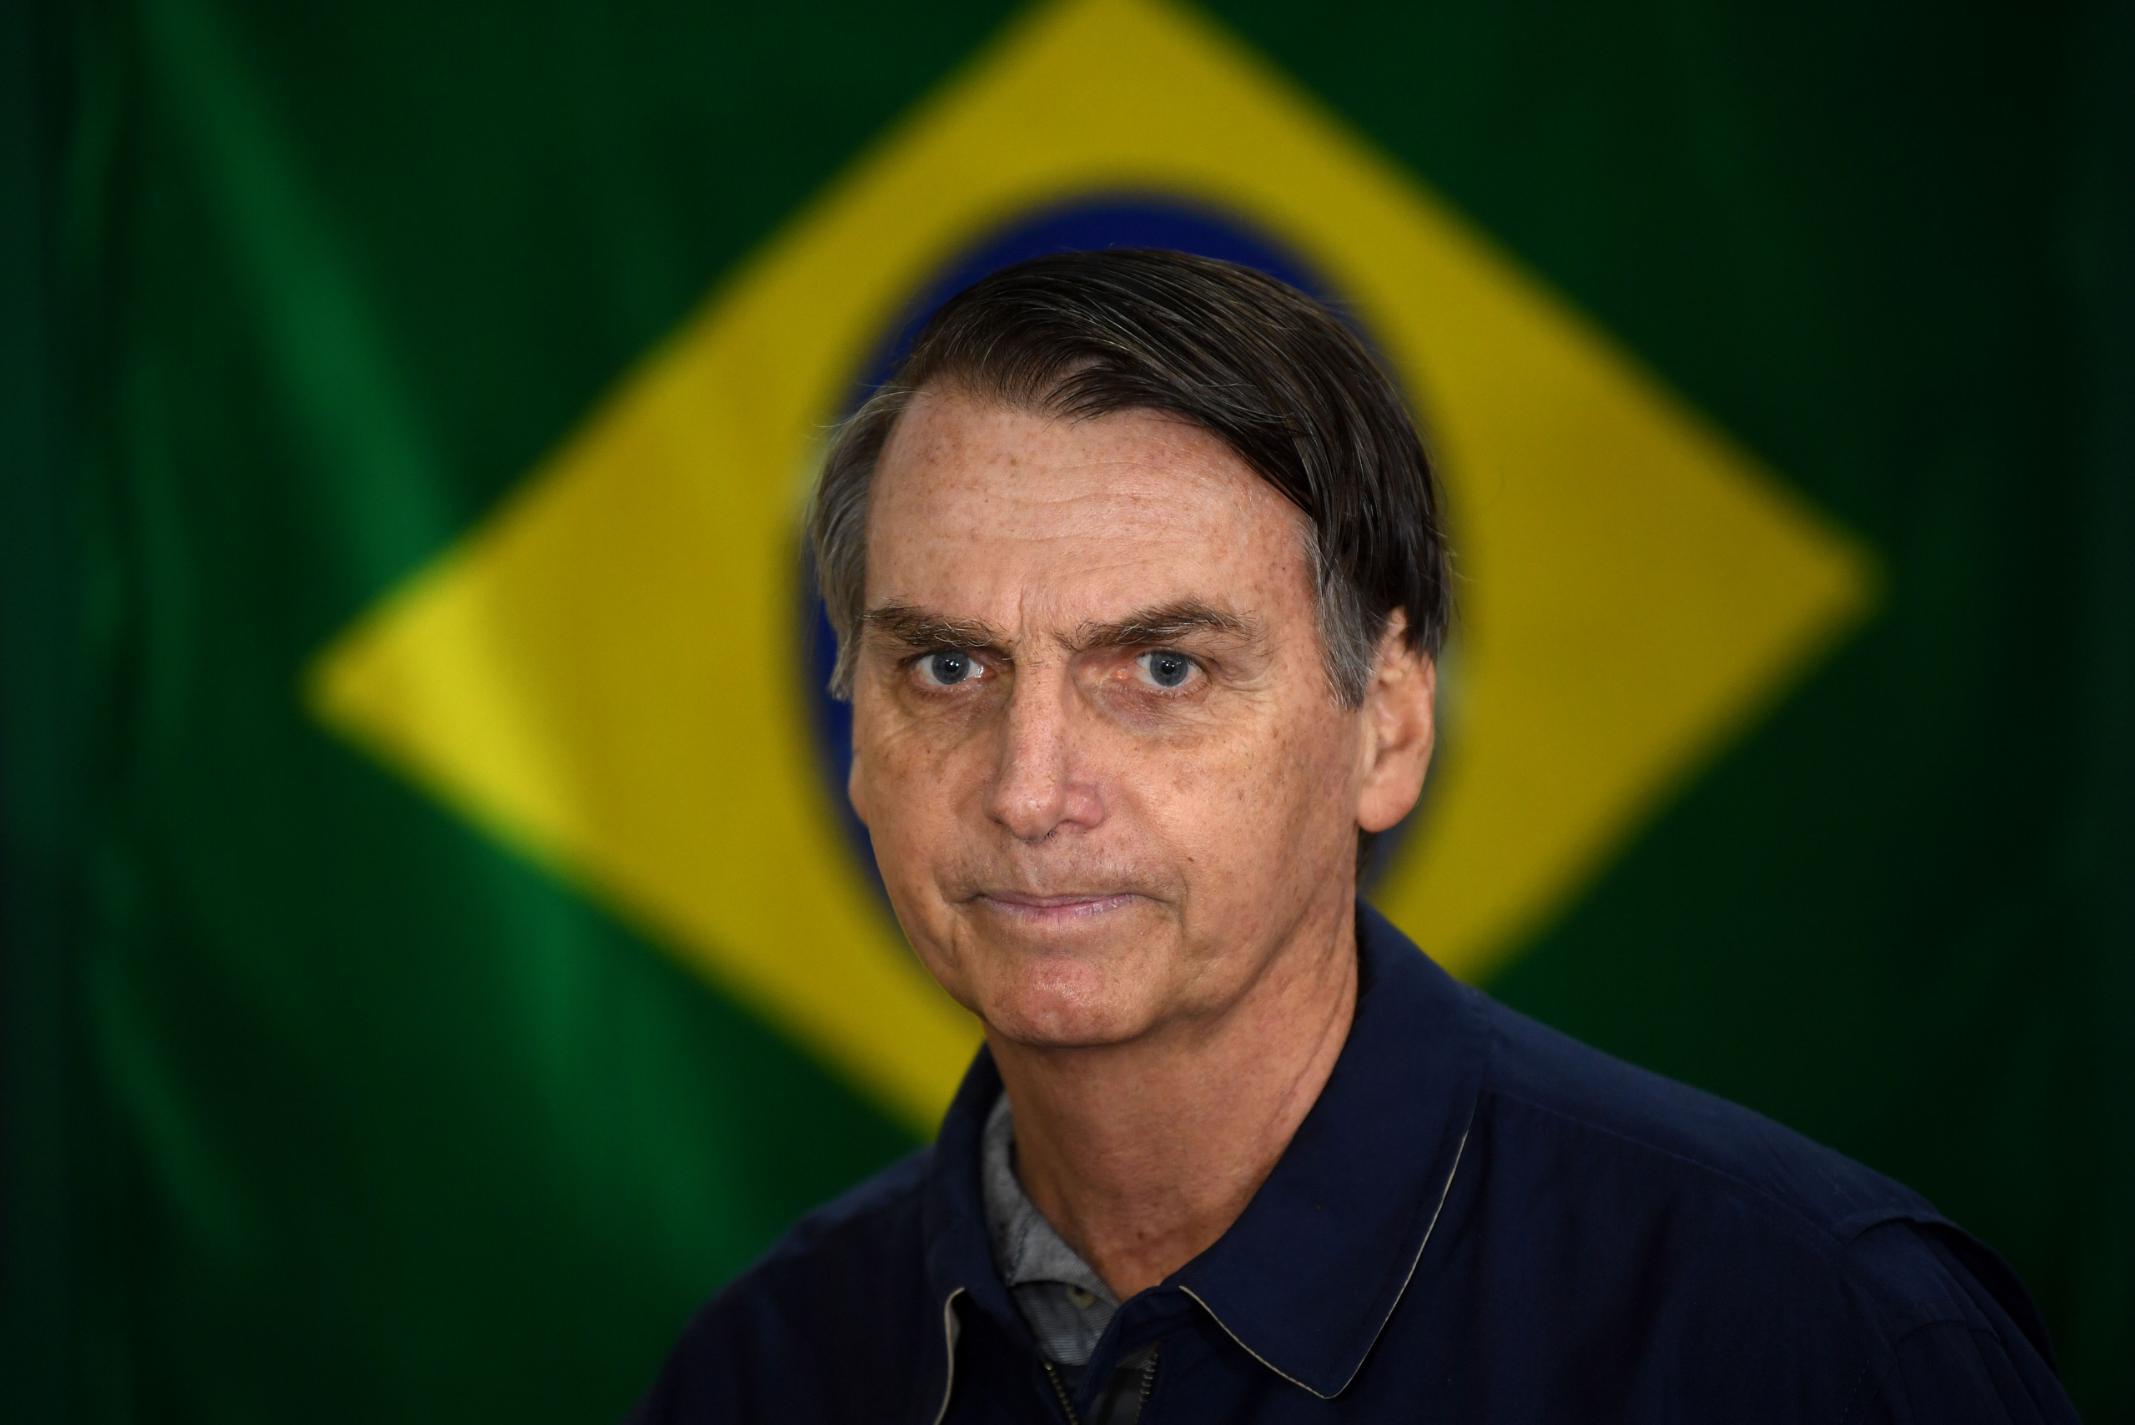 Brazilian President Jair Bolsonaro tells fans he had lung screening